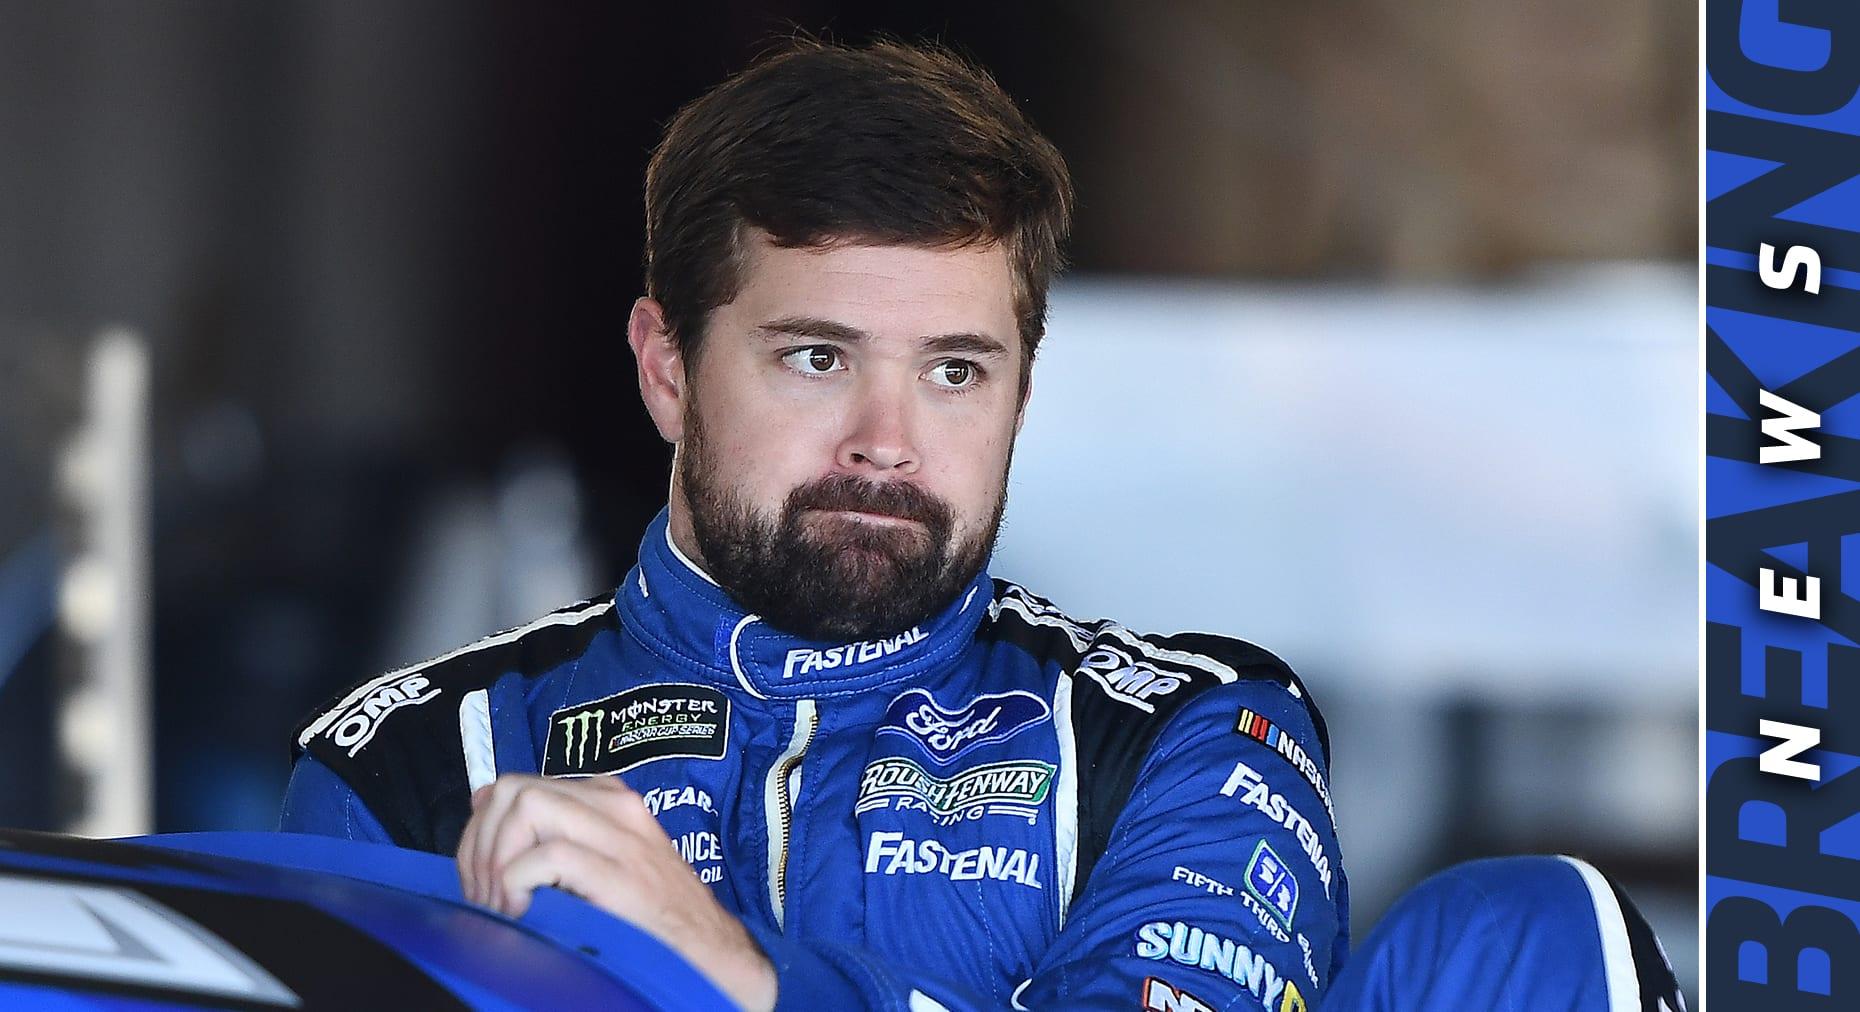 Stenhouse Jr. to drive for JTG Daugherty Racing in 2020 – NASCAR